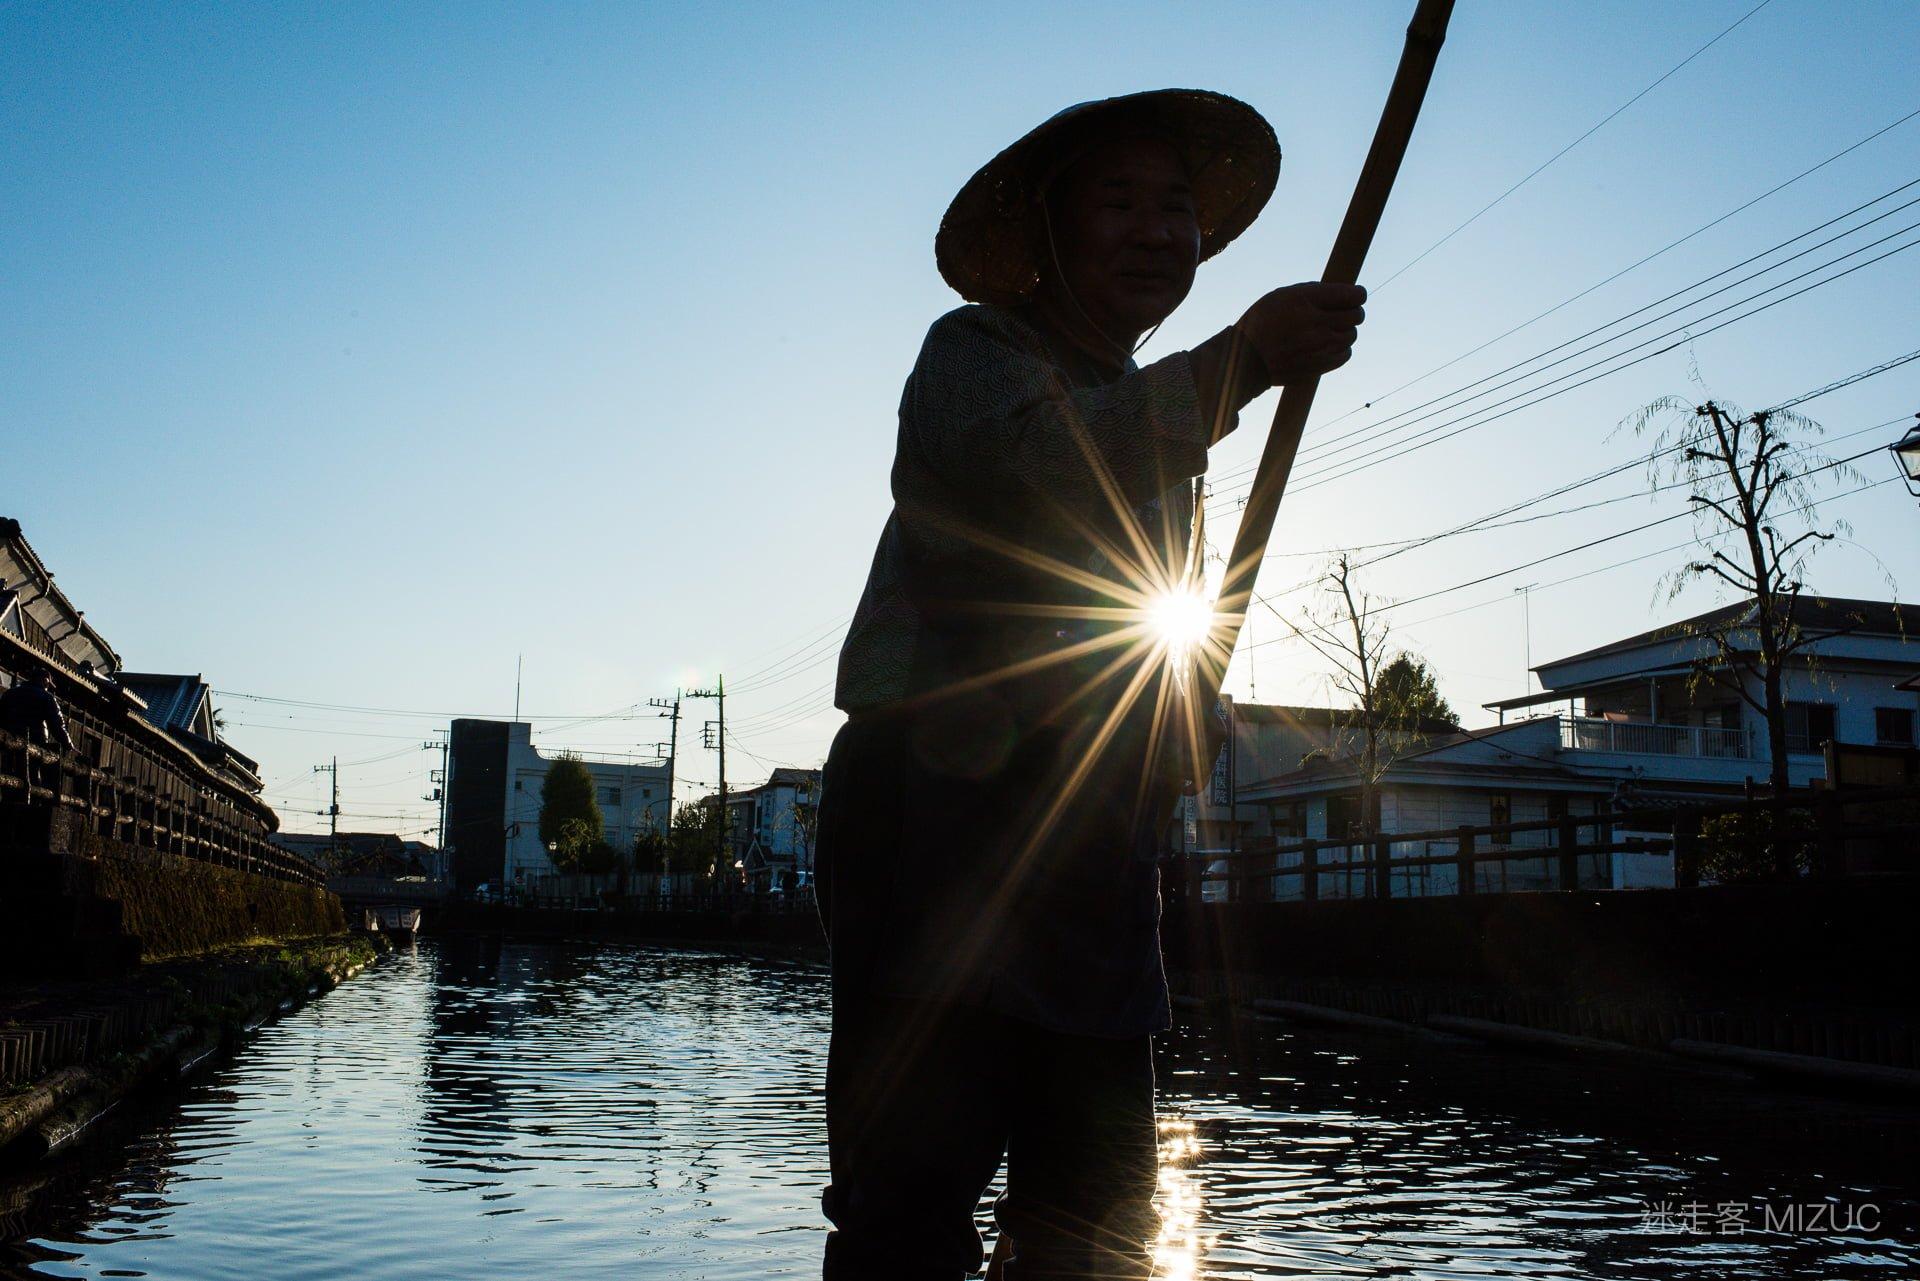 201711 Ibaraki Tochigi Gunma Japan Travel By RentalCar 62 日本自駕旅遊/北關東三縣「茨城、櫪木、群馬」秋天美食、溫泉與瀑布秘境百景(精選照片分享)